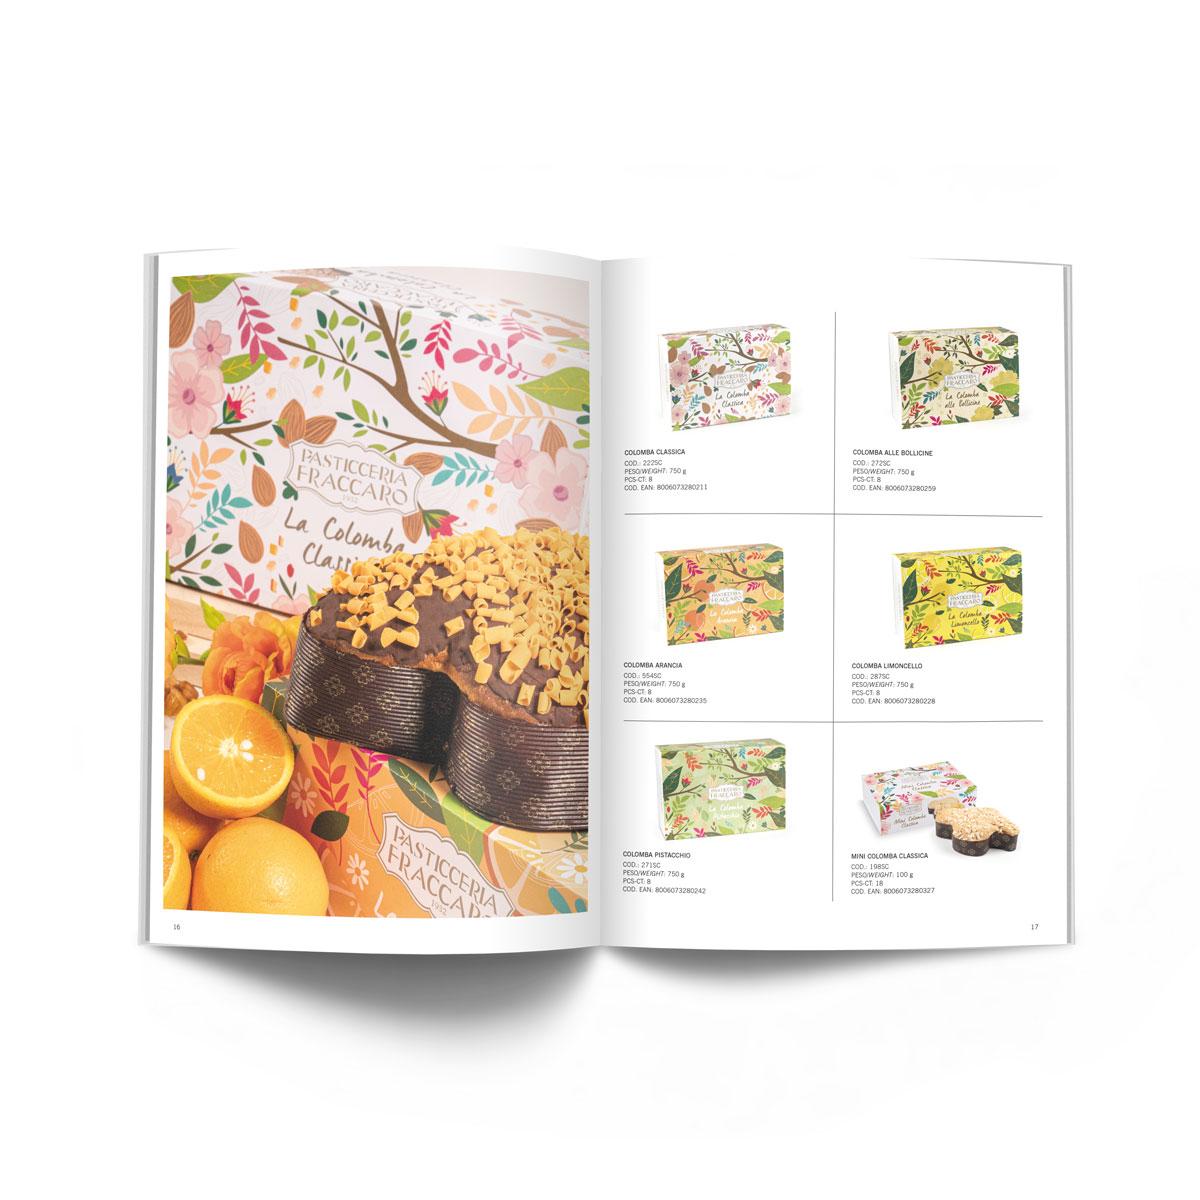 Catalogo-pagine-1